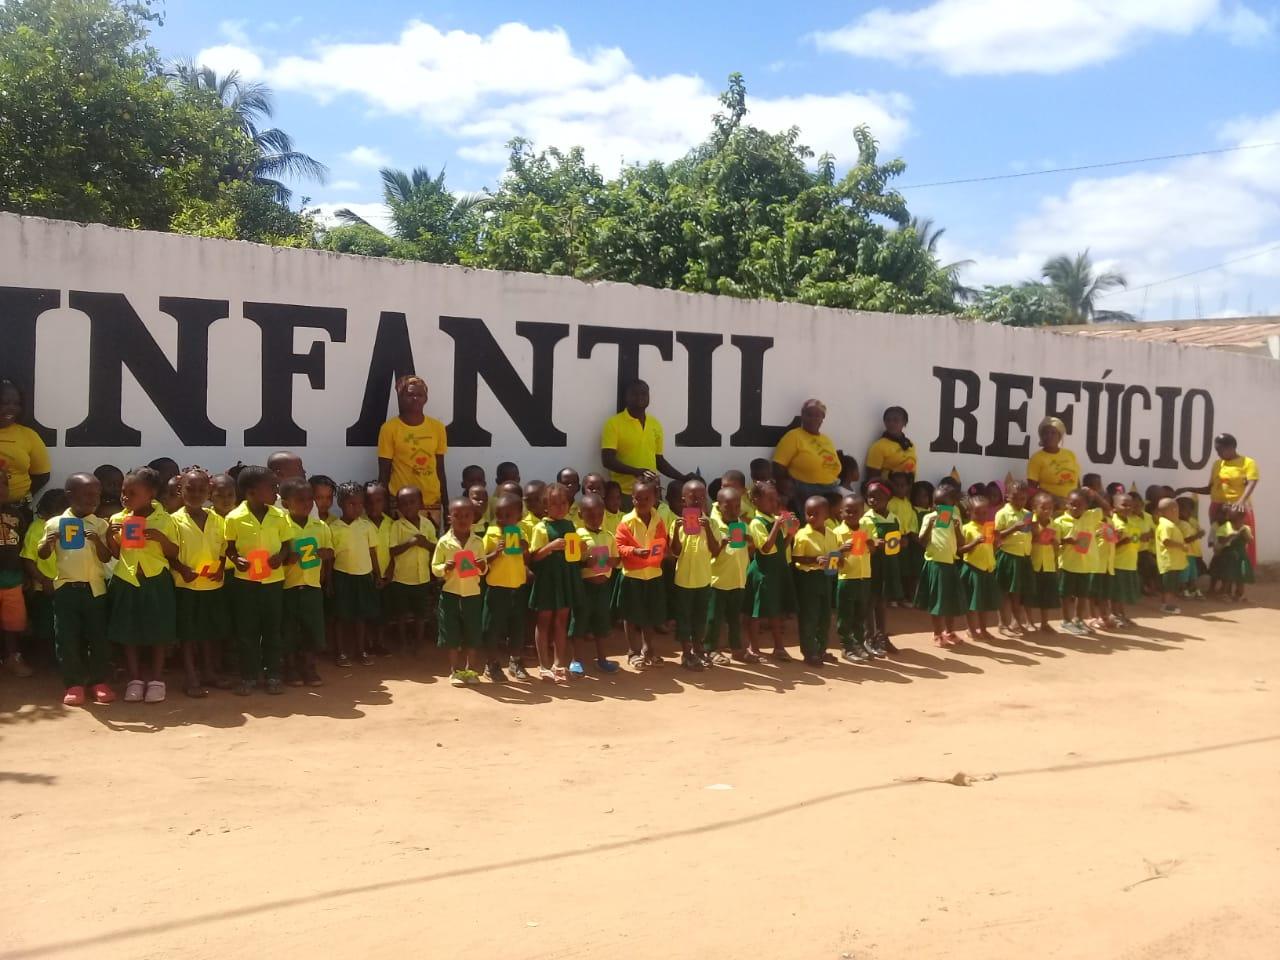 Centro Infantil Refúgio na África completa 5 anos